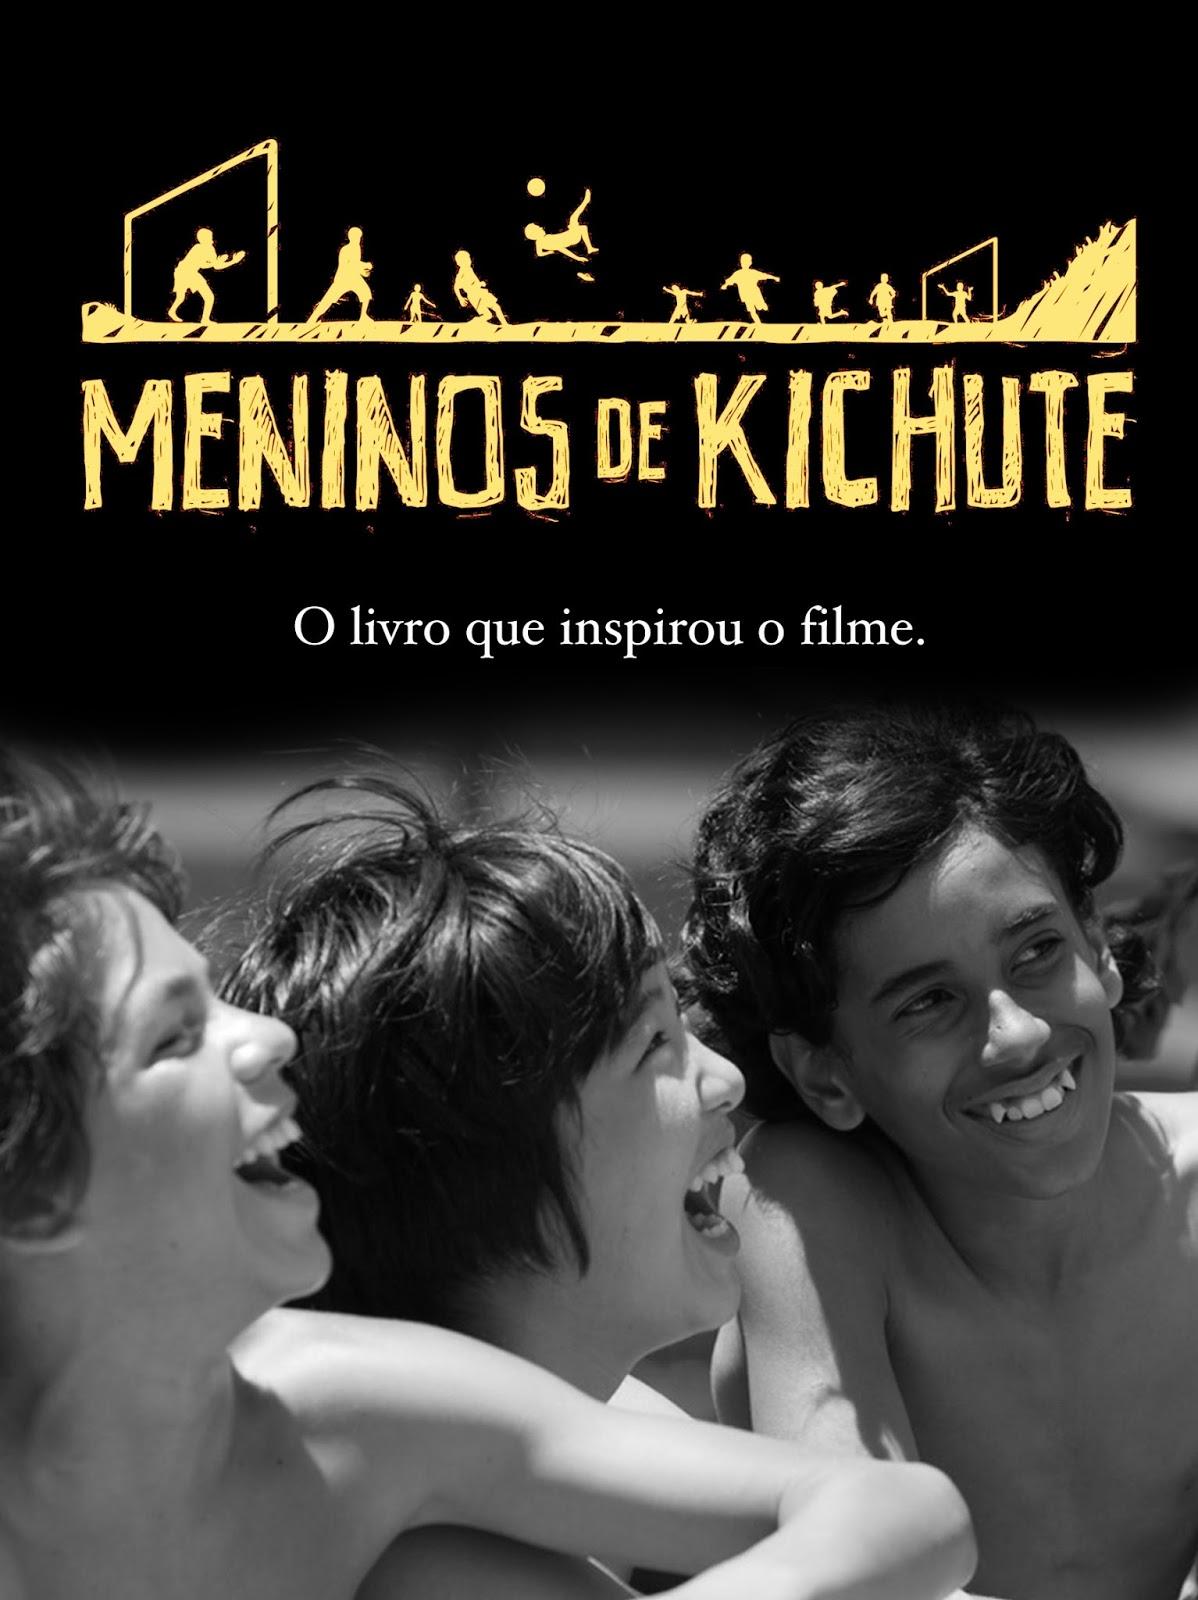 Meninos de Kichute